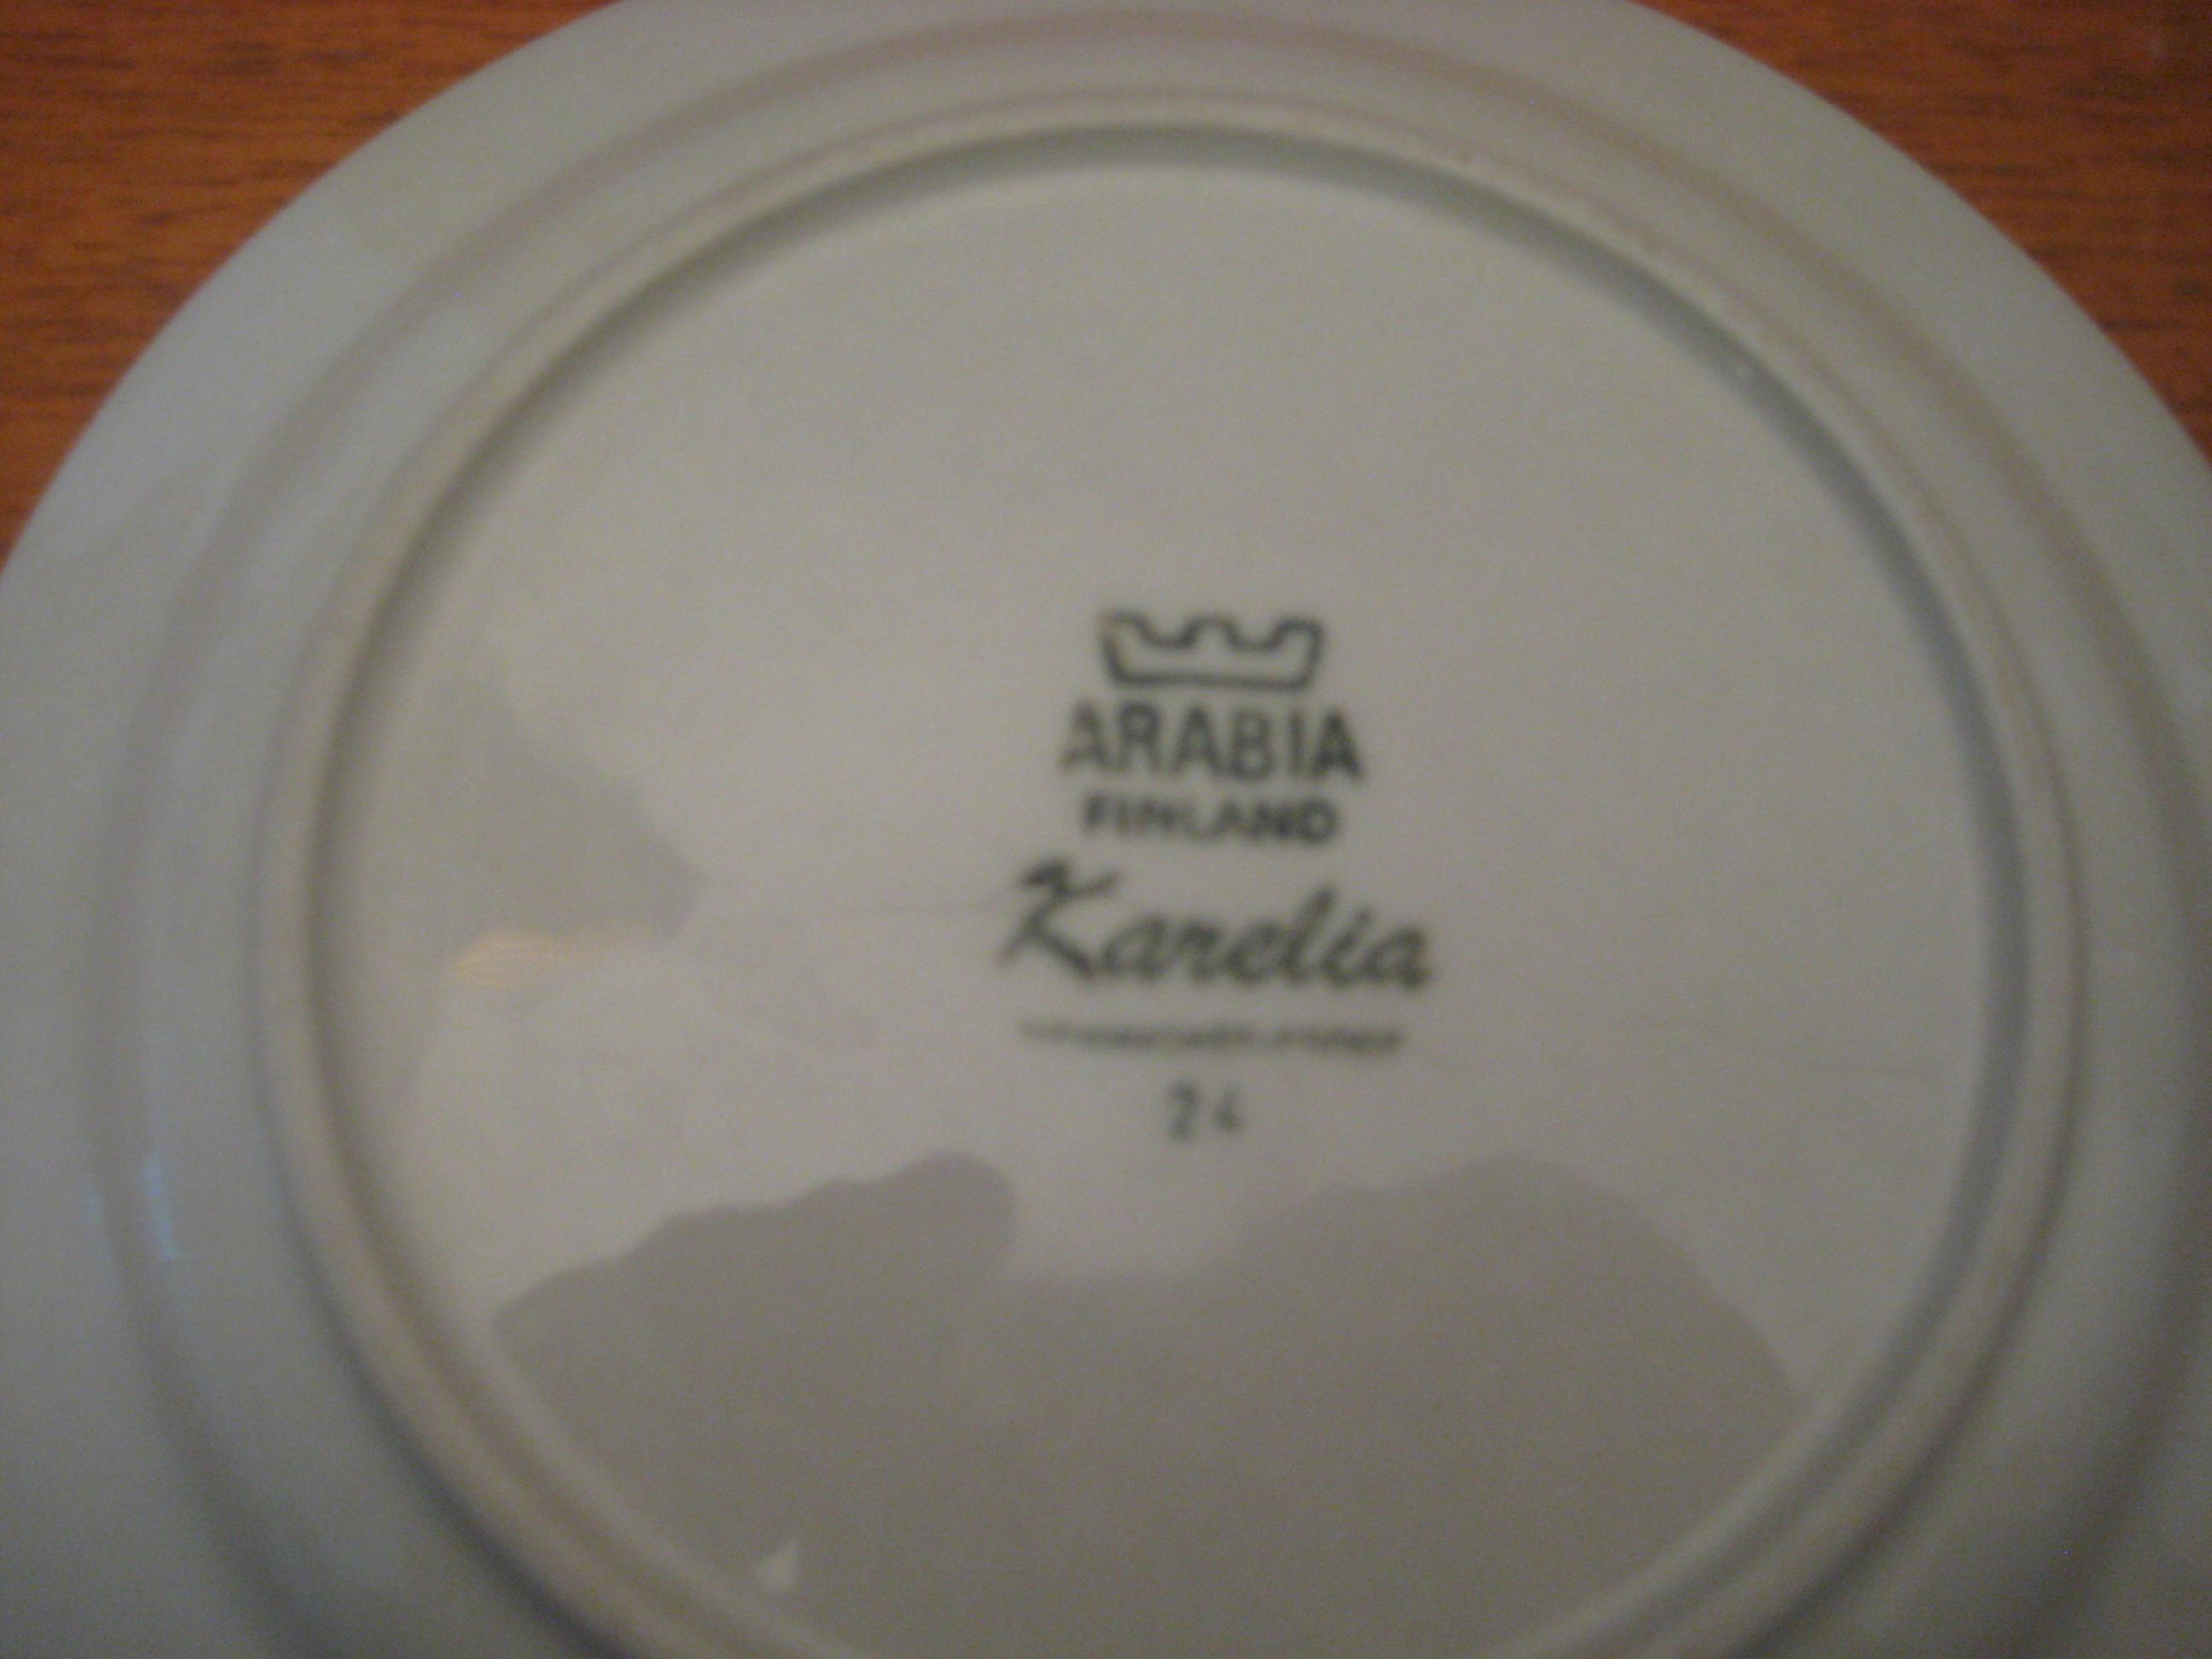 Arabia Karelia testel